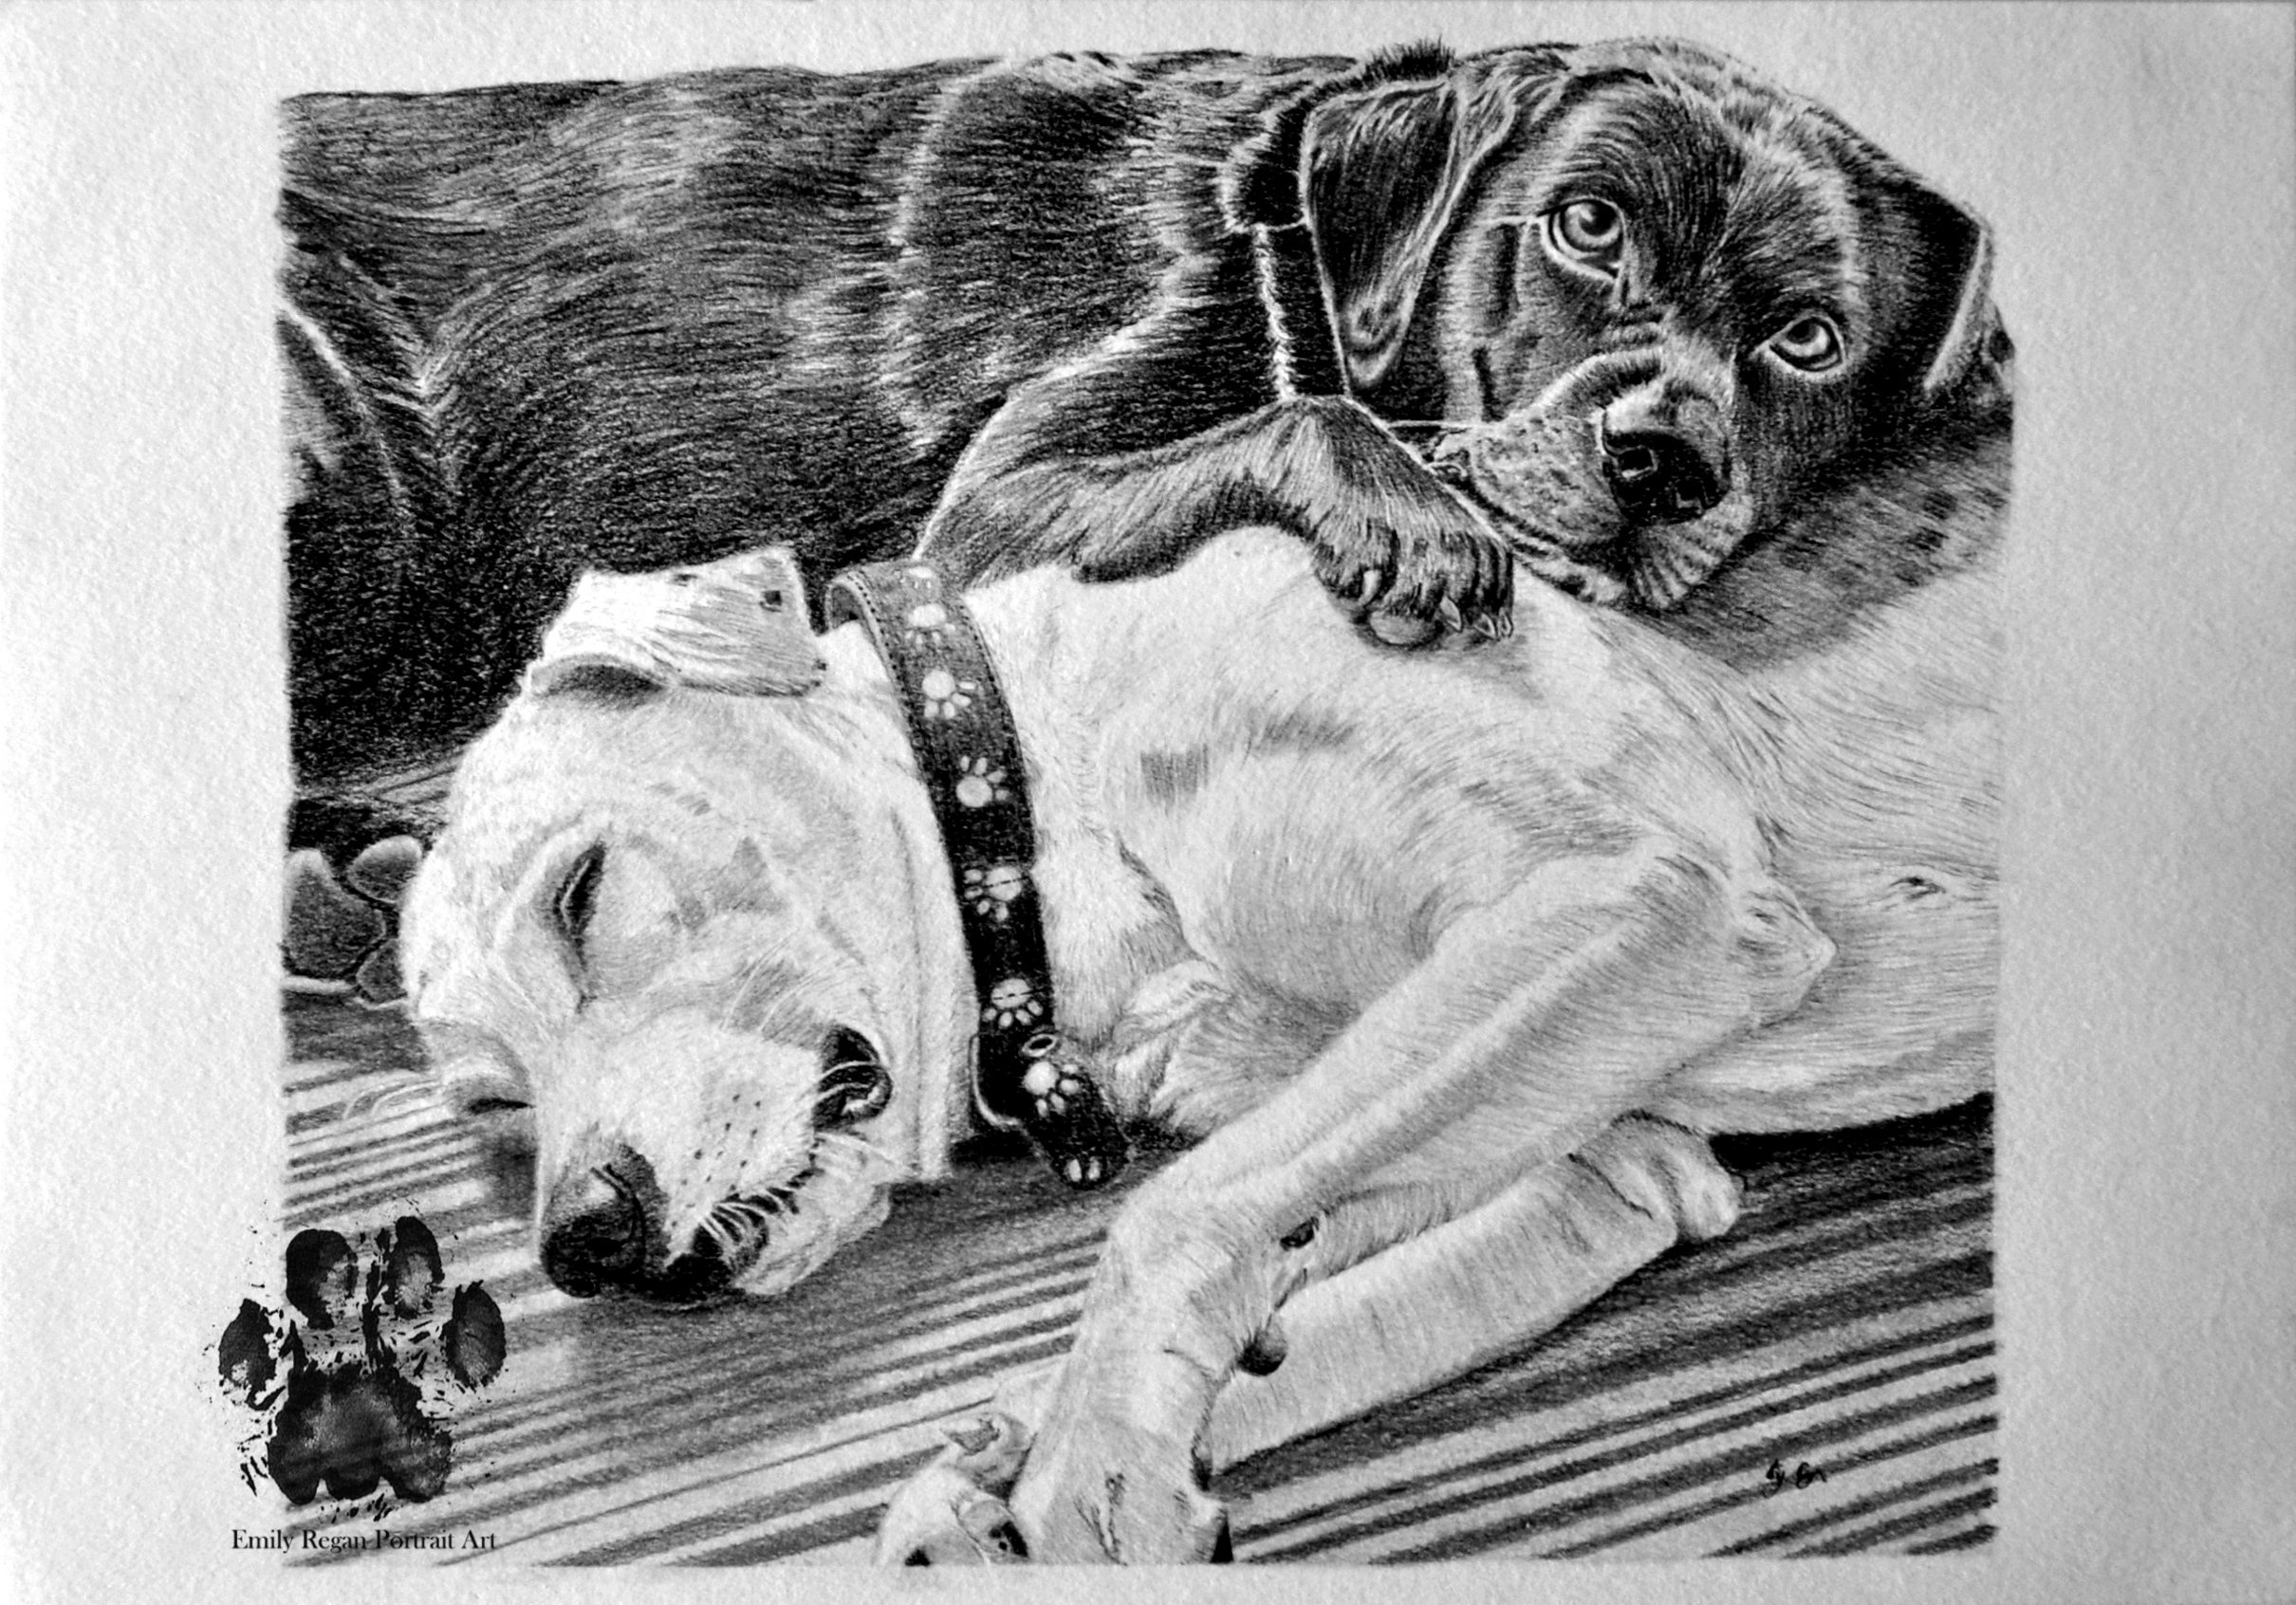 Marley & Lola Graphite